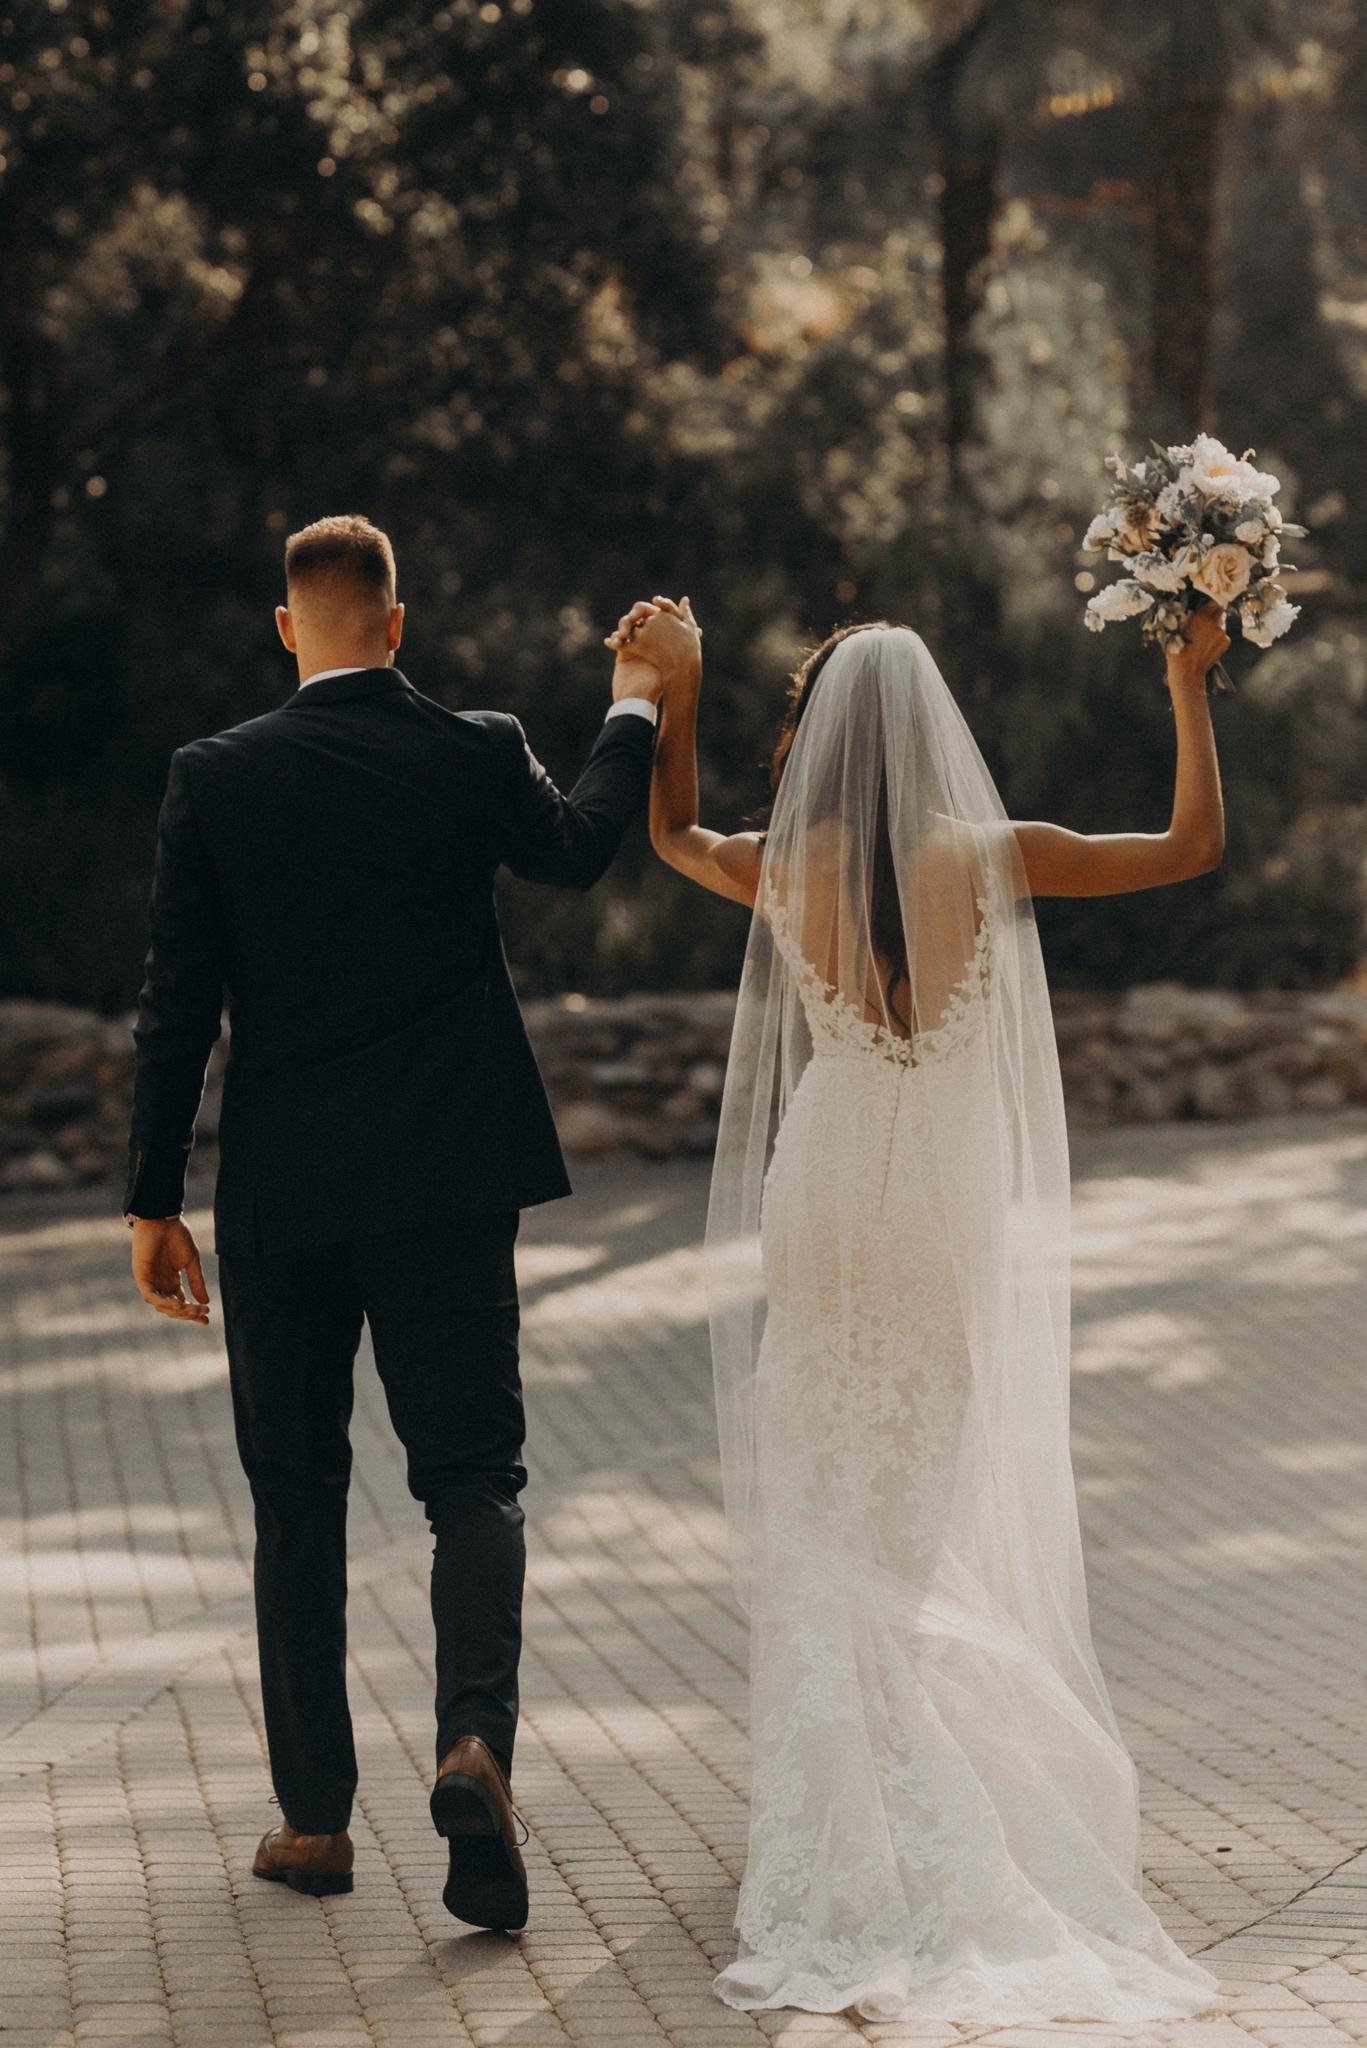 Isaiah + Taylor Photography - Rancho Las Lomas Wedding, Los Angeles Wedding Photographer-087.jpg